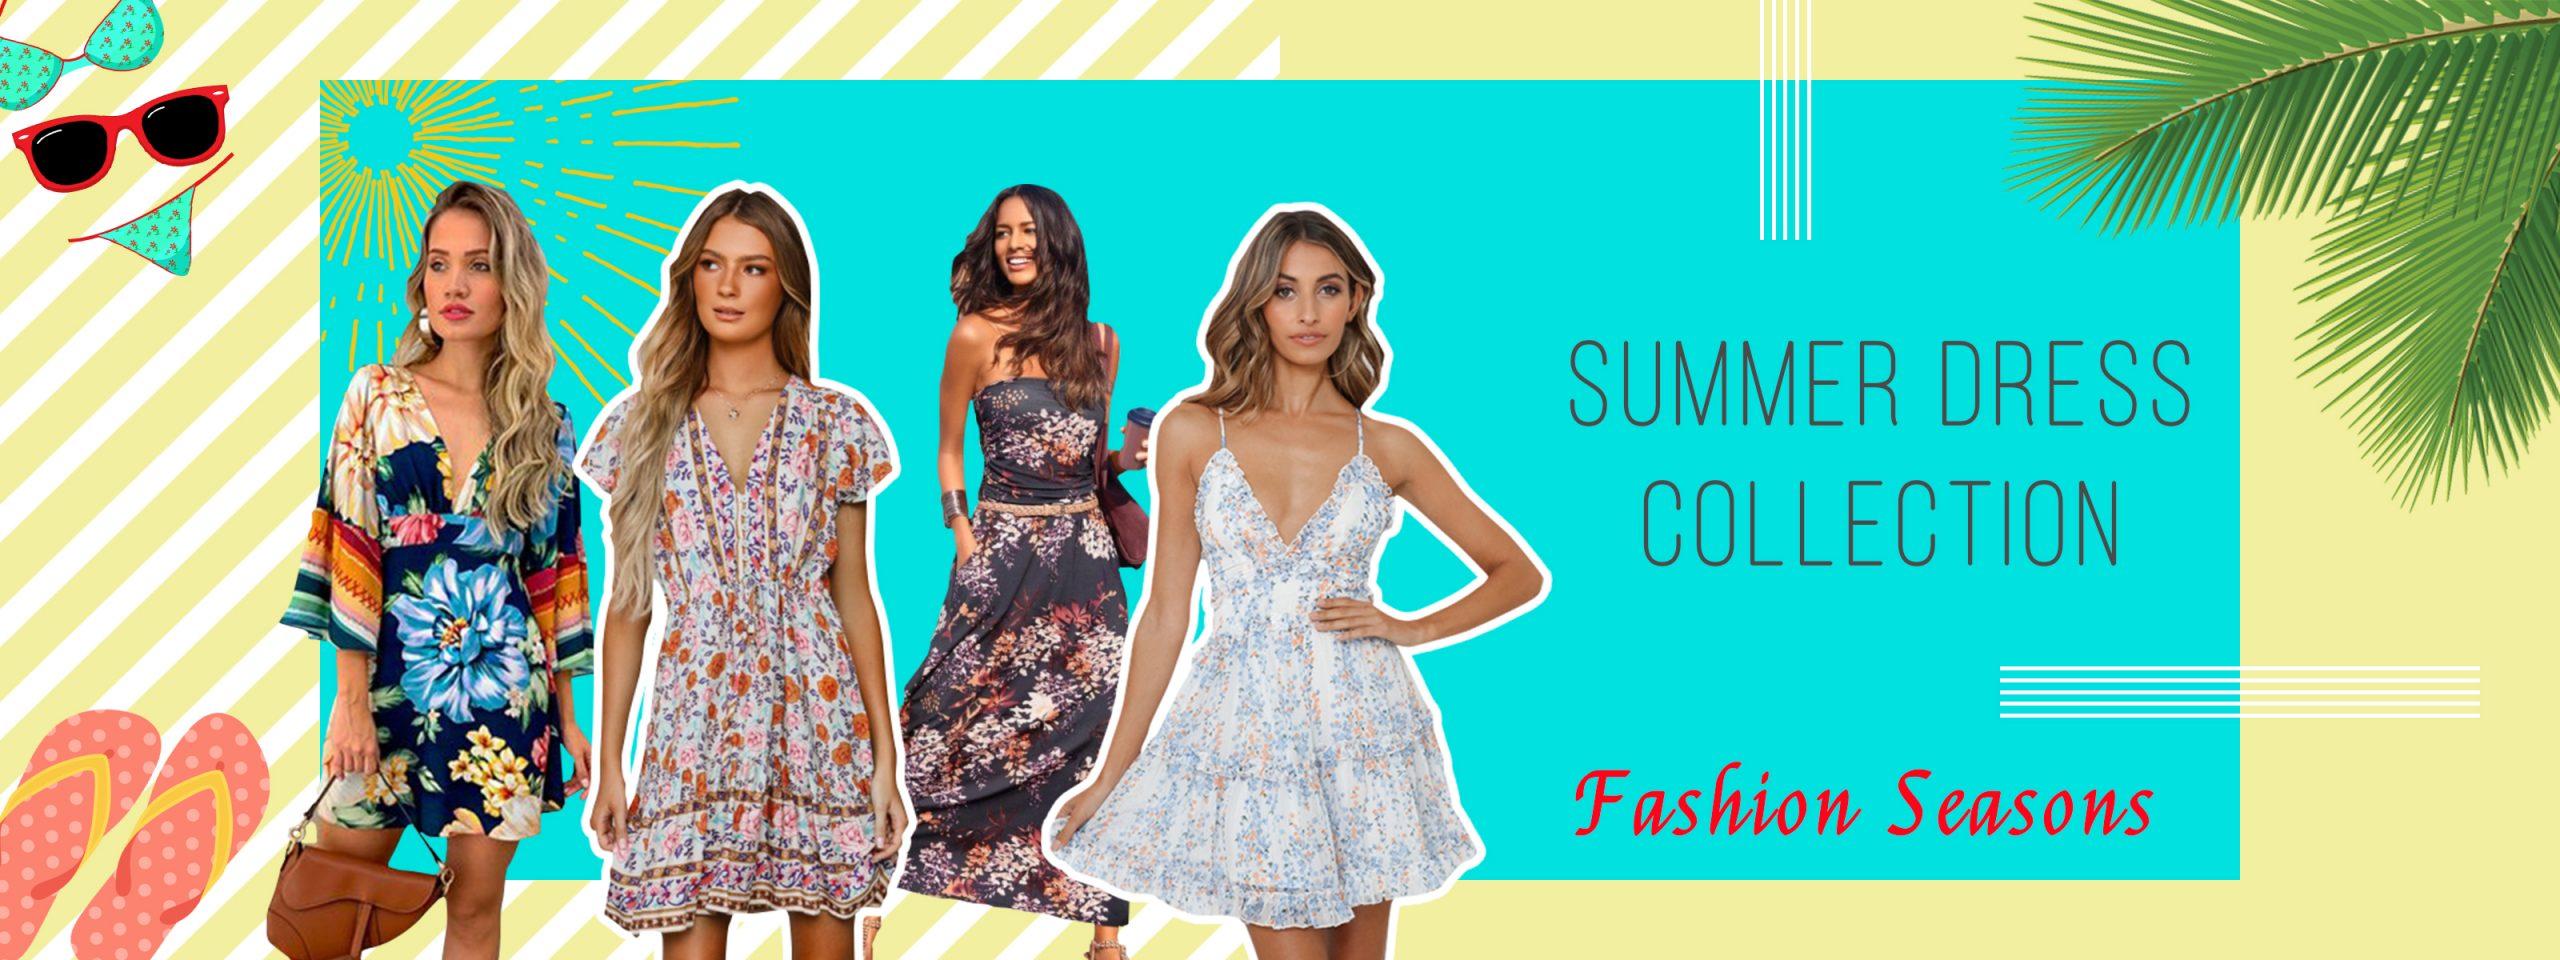 Fashion-Seasons-Summer-Dress